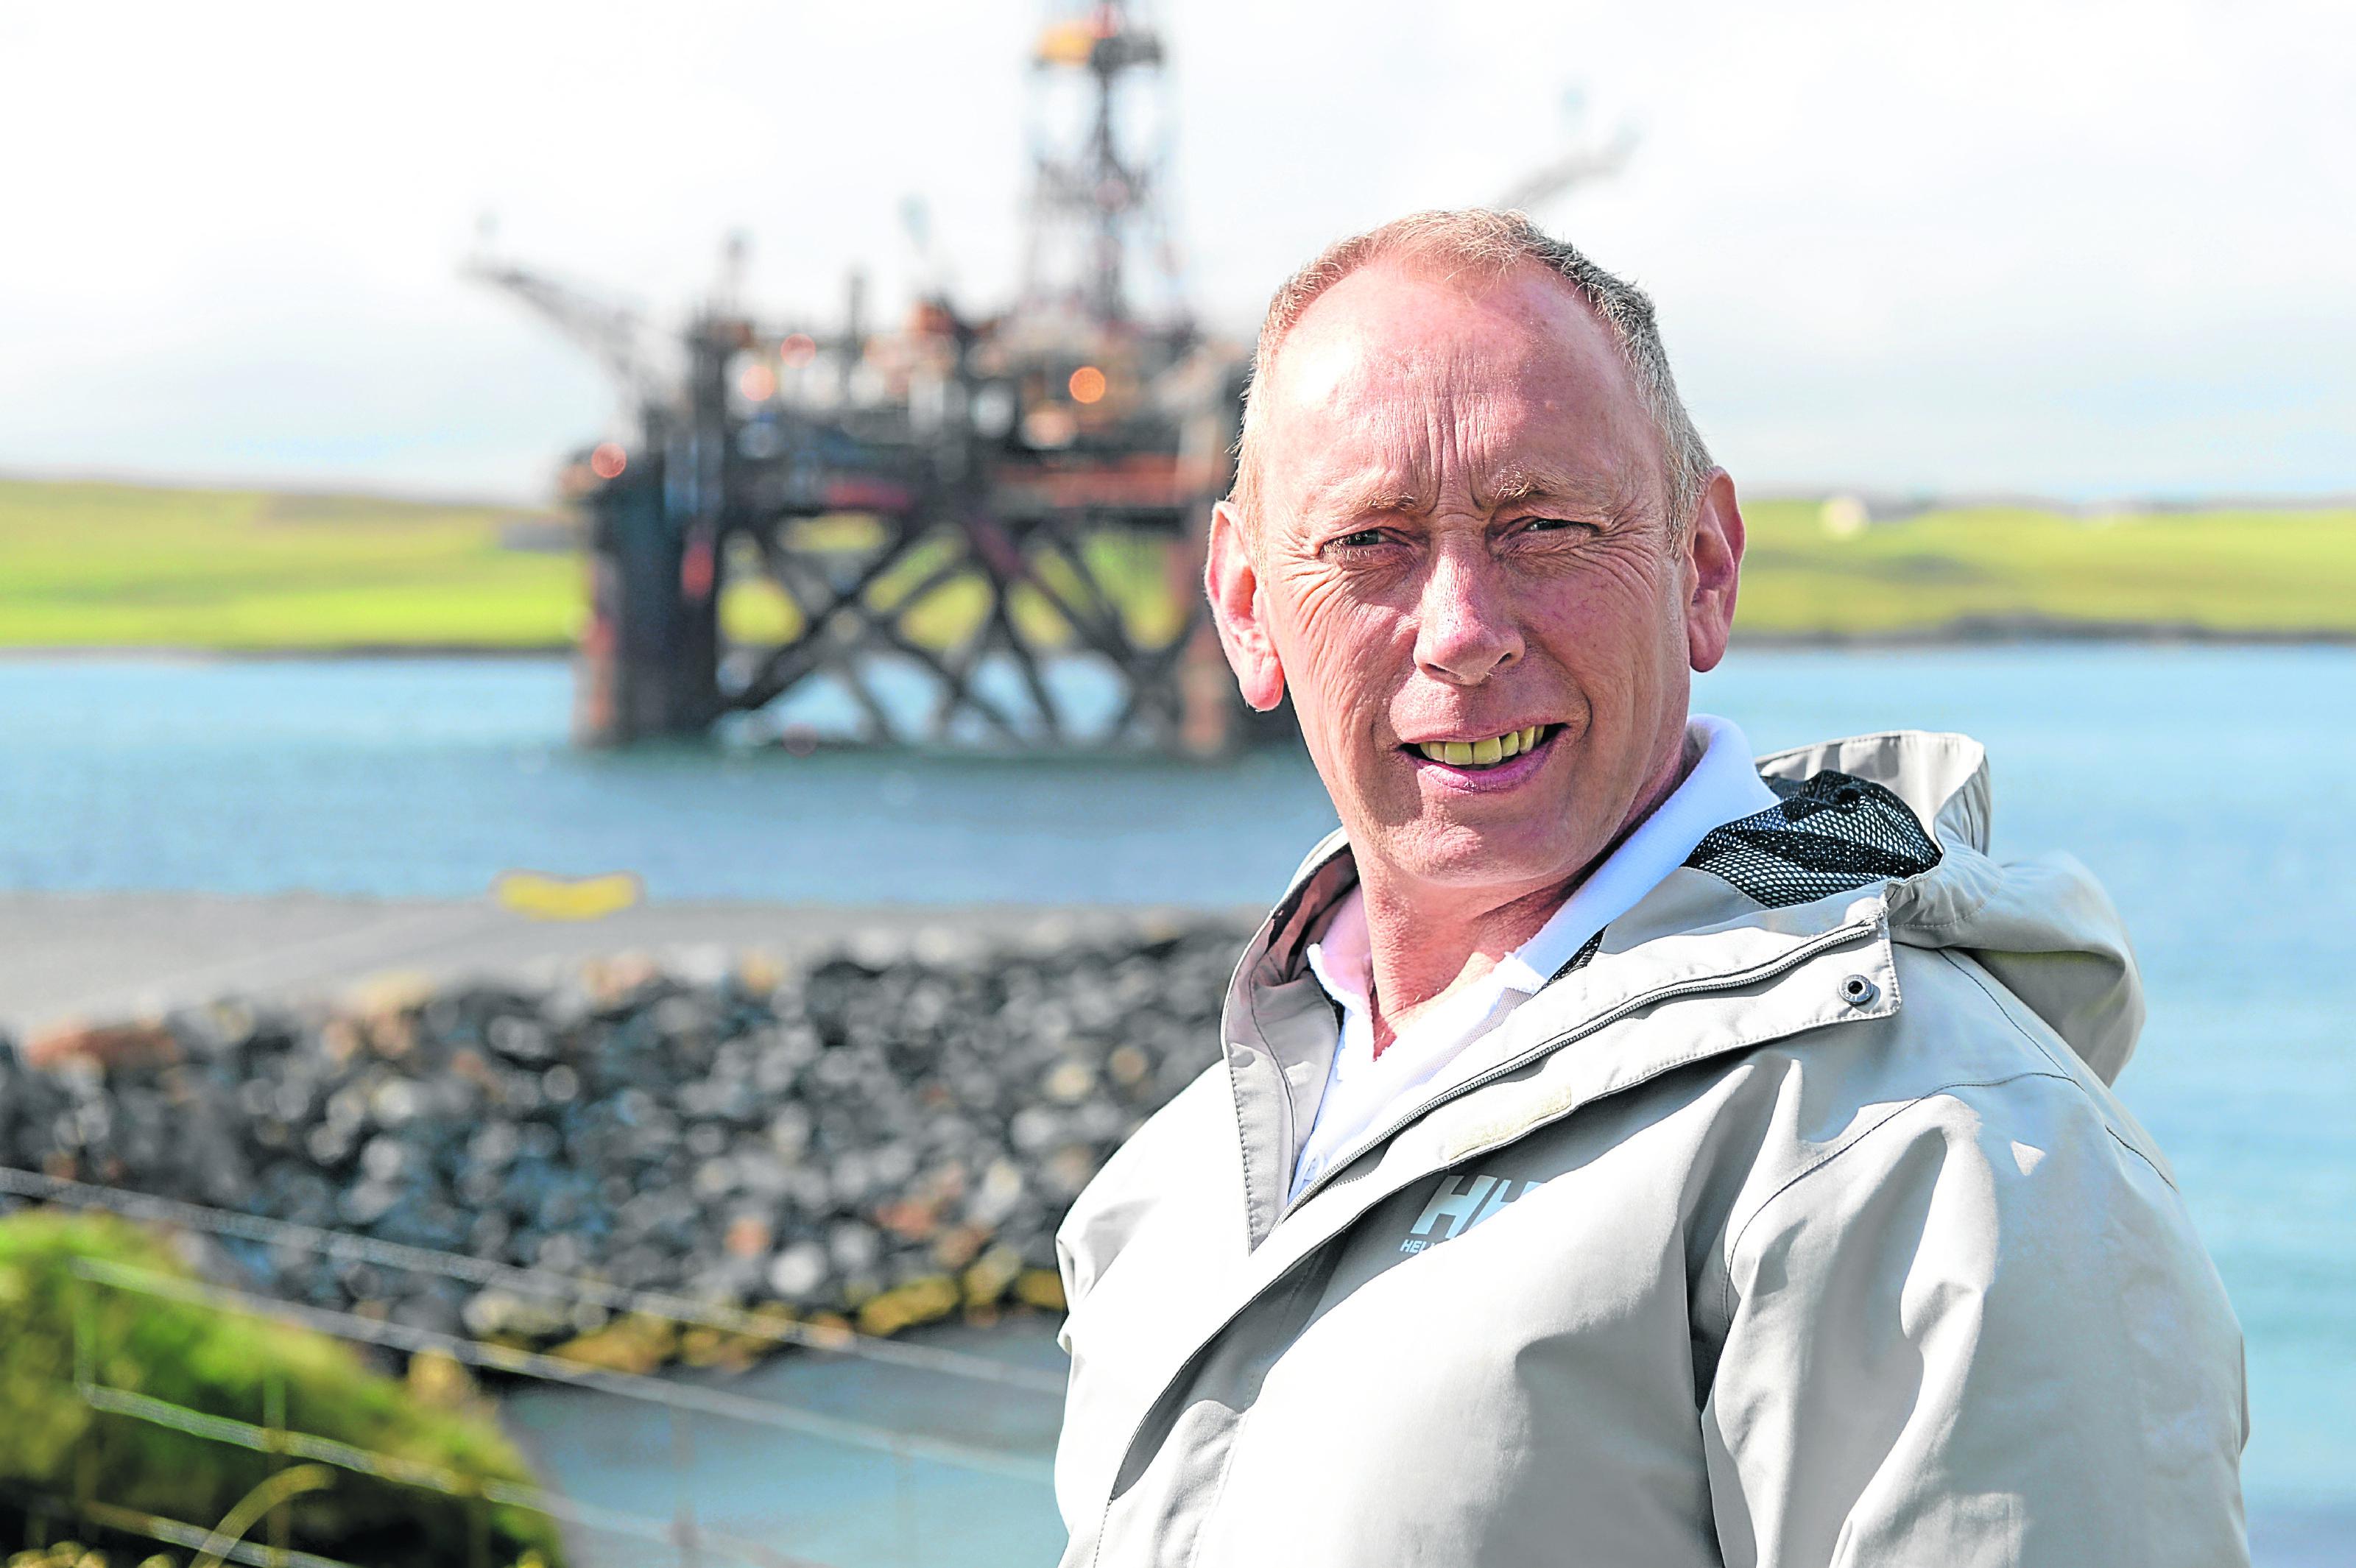 Small business focus on Finlay J MacBeath, who runs oil and gas service company Haldis Solutions Ltd.